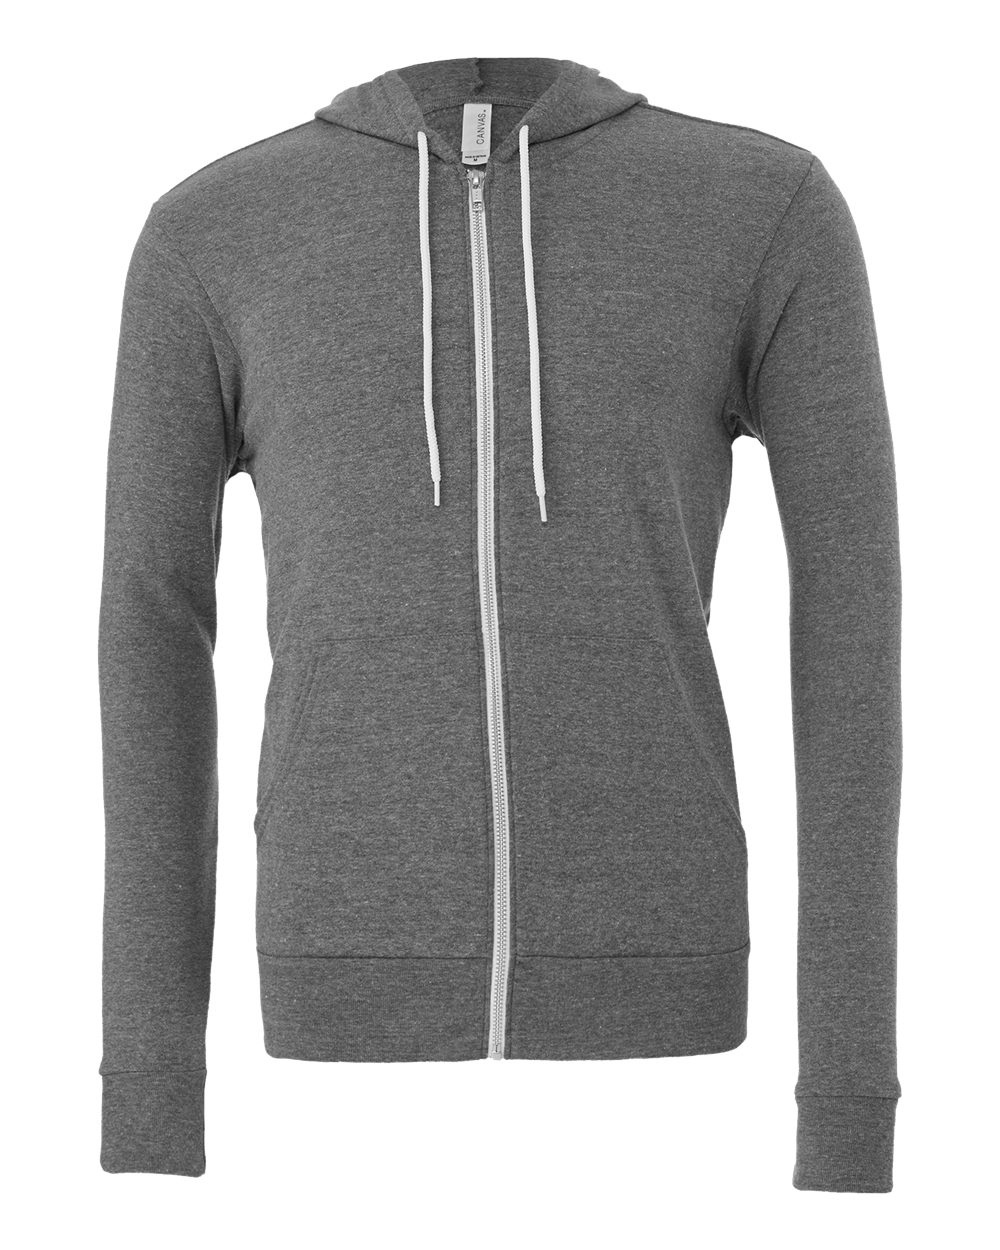 Bella-Canvas-Unisex-Full-Zip-Up-Hooded-Sweatshirt-Blank-Hoodie-3739-up-to-3XL thumbnail 21